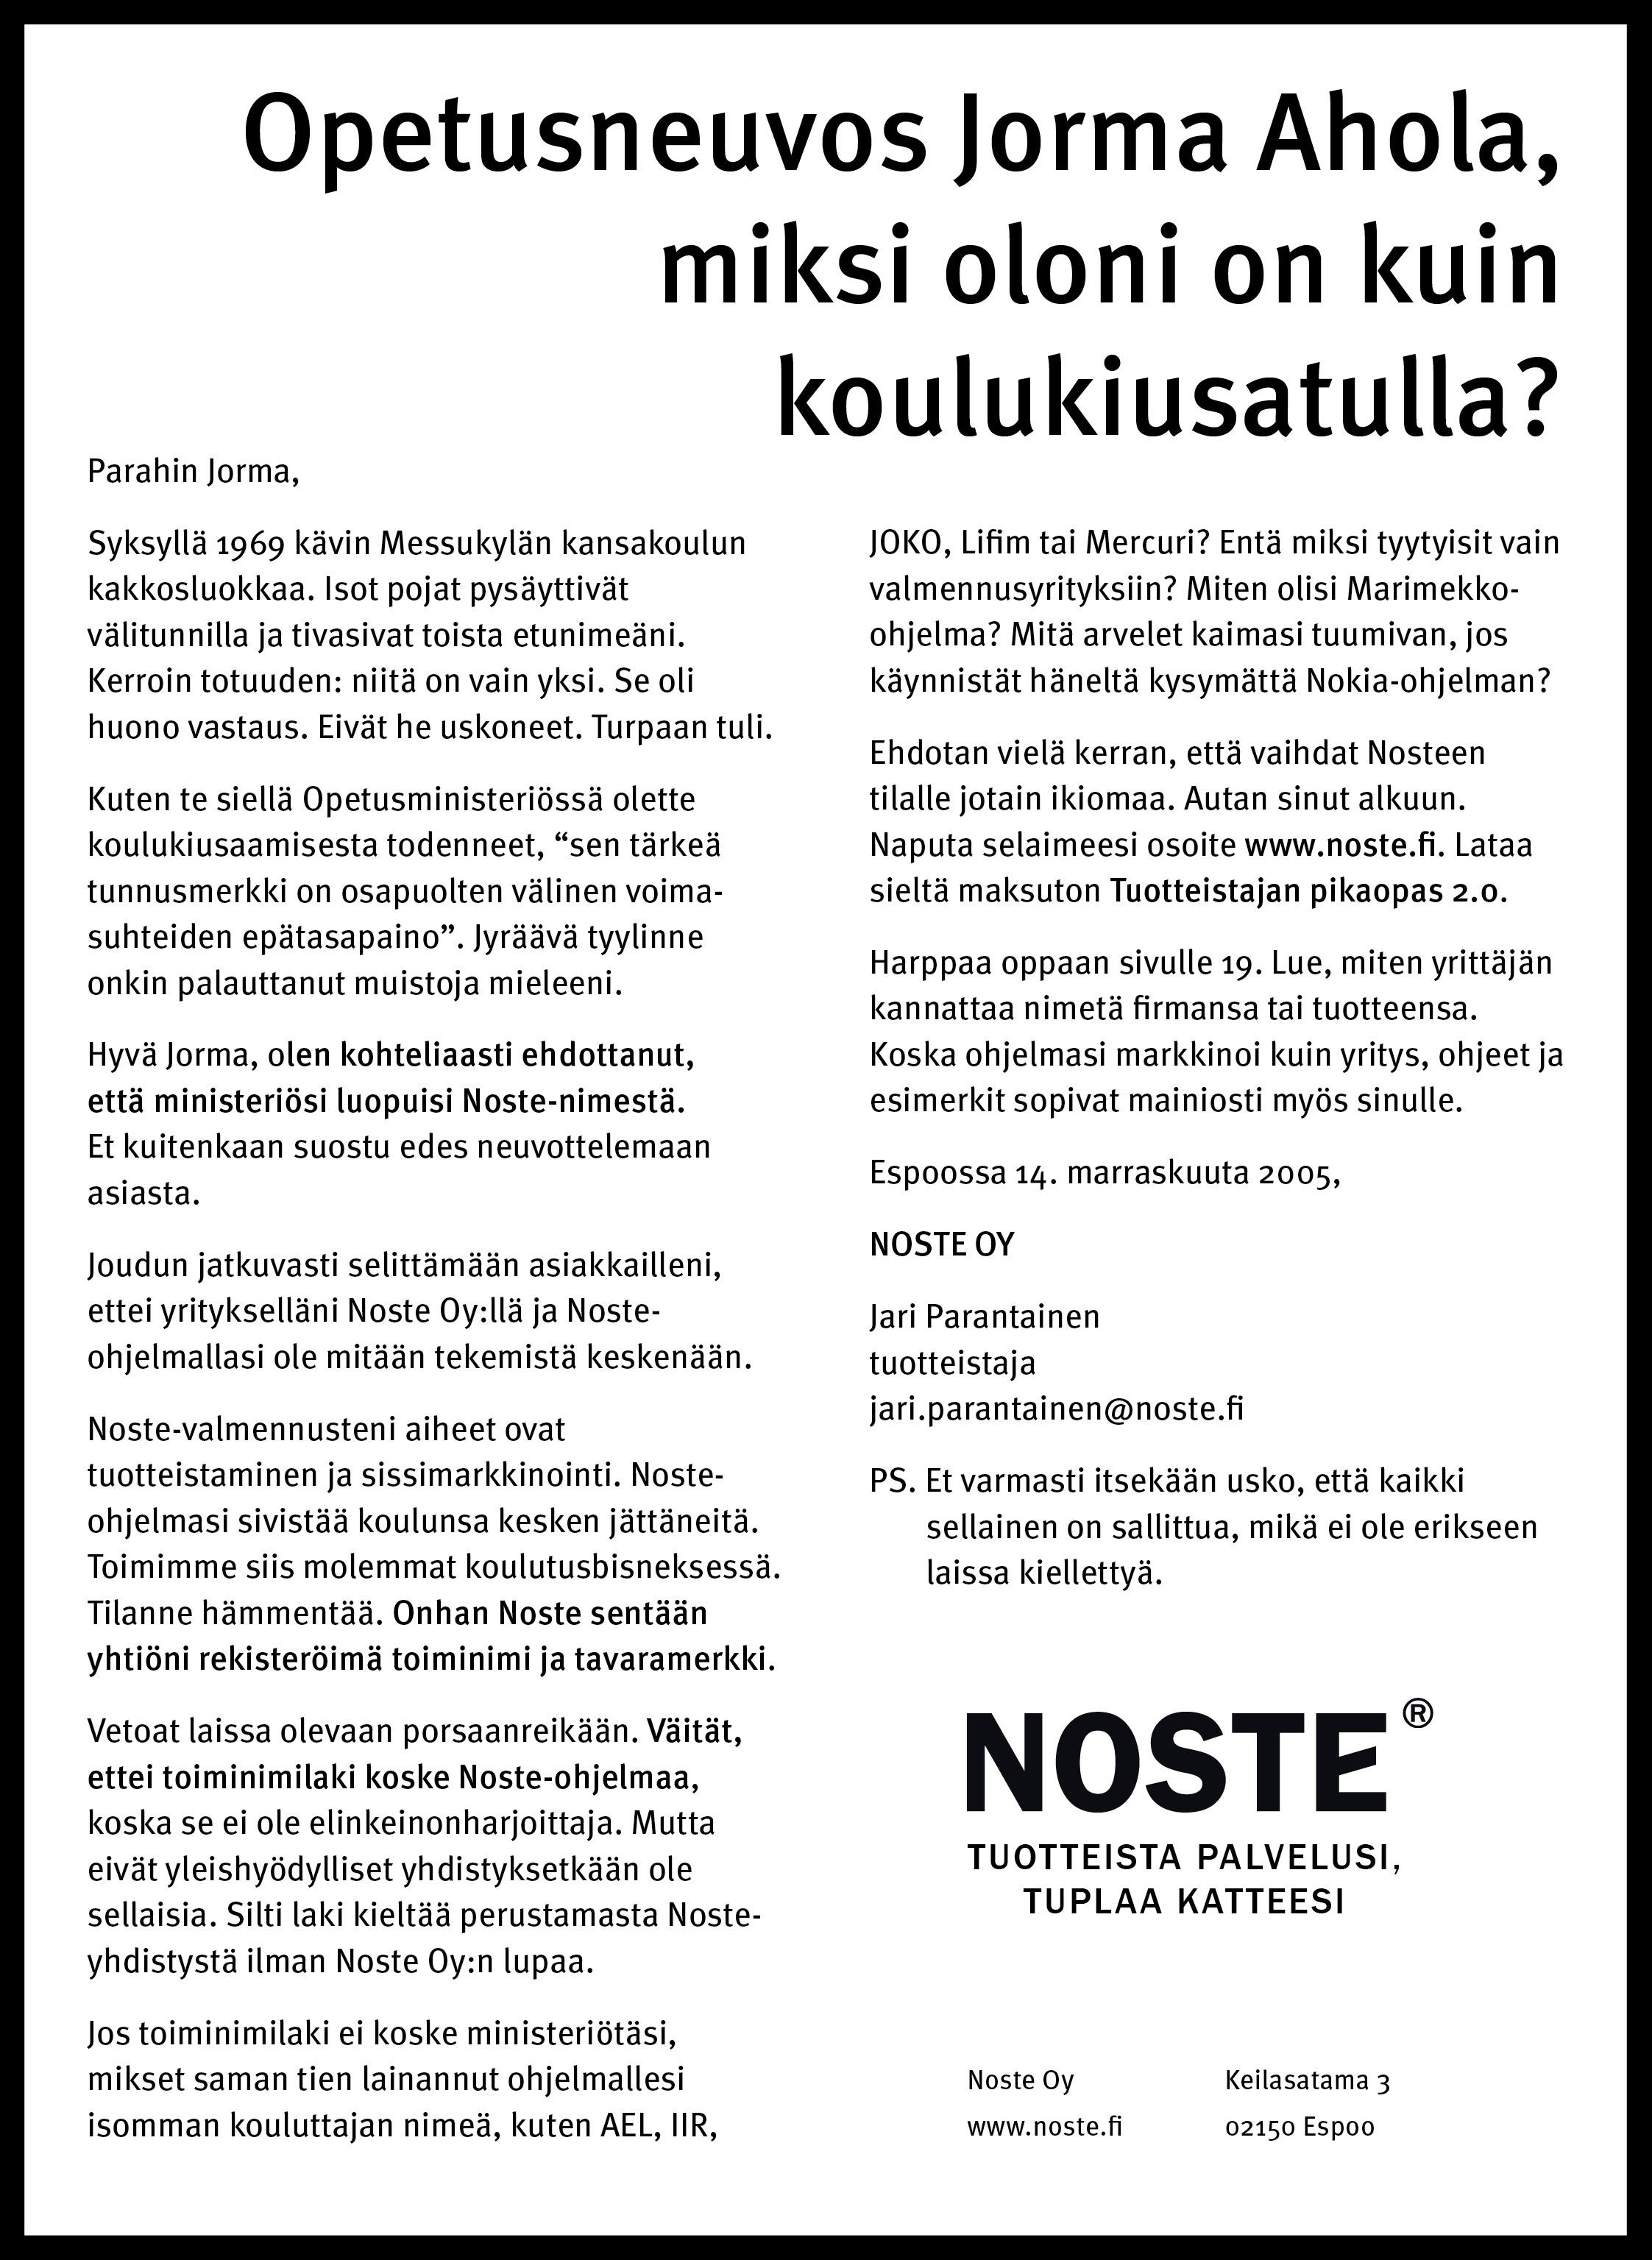 Avoin kirje opetusneuvos Jorma Aholalle